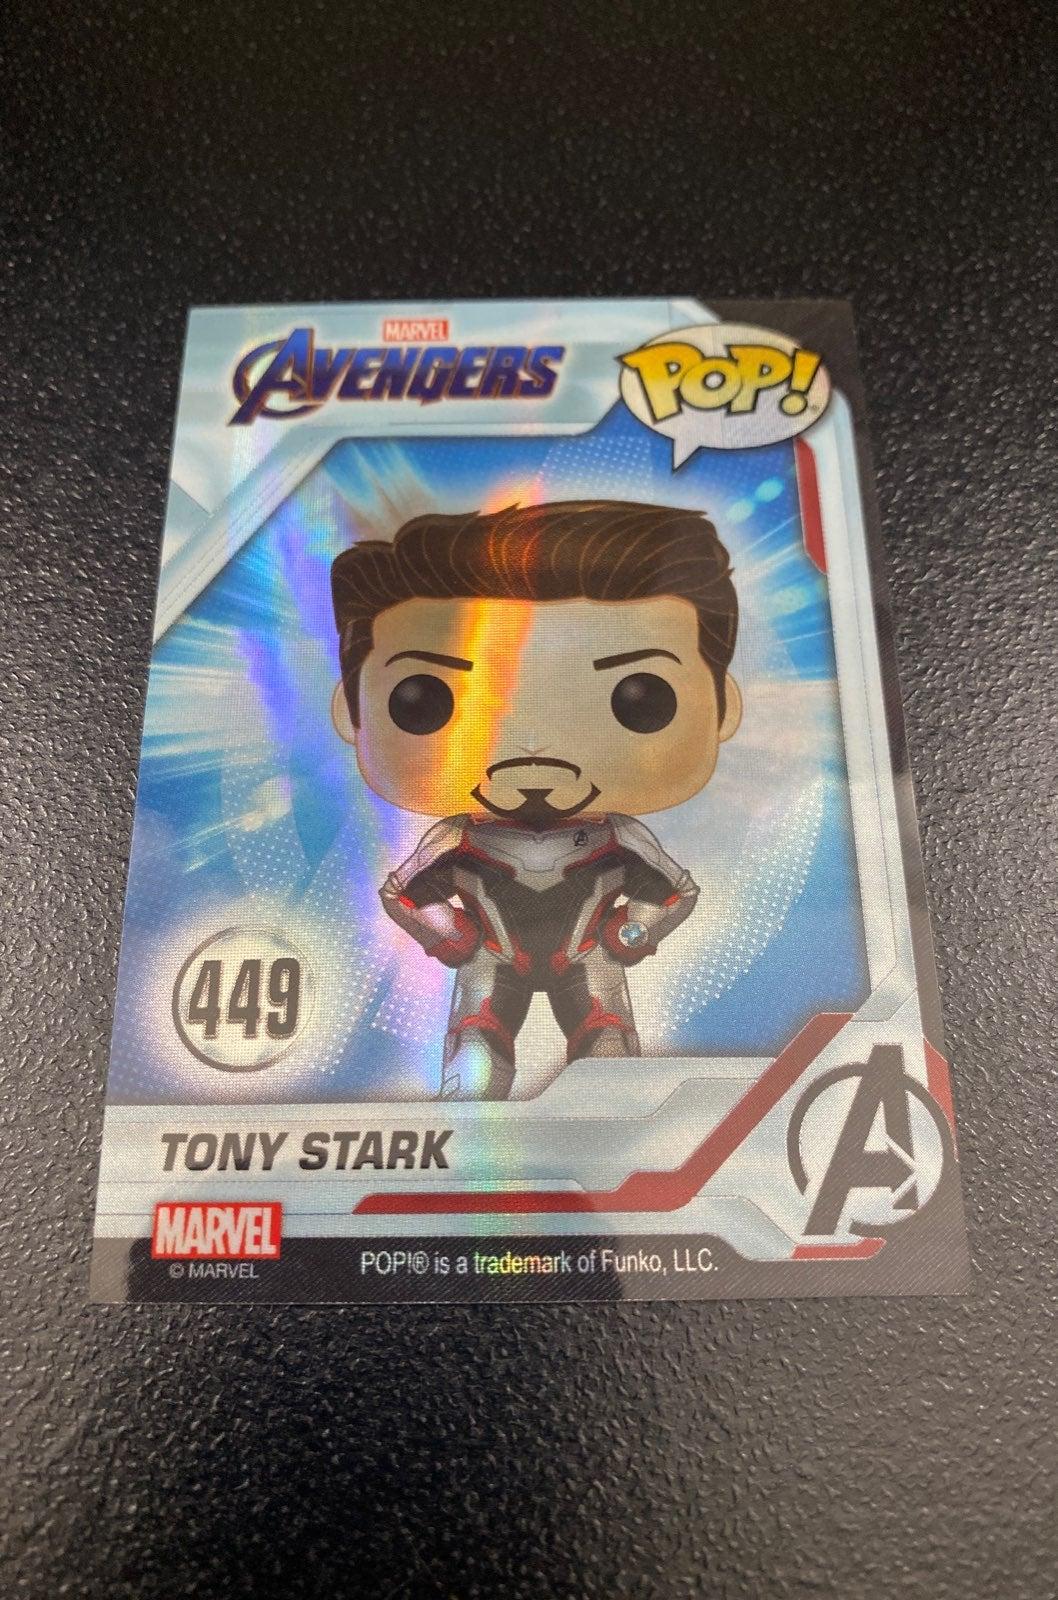 Holographic EE Avengers Tony Stark